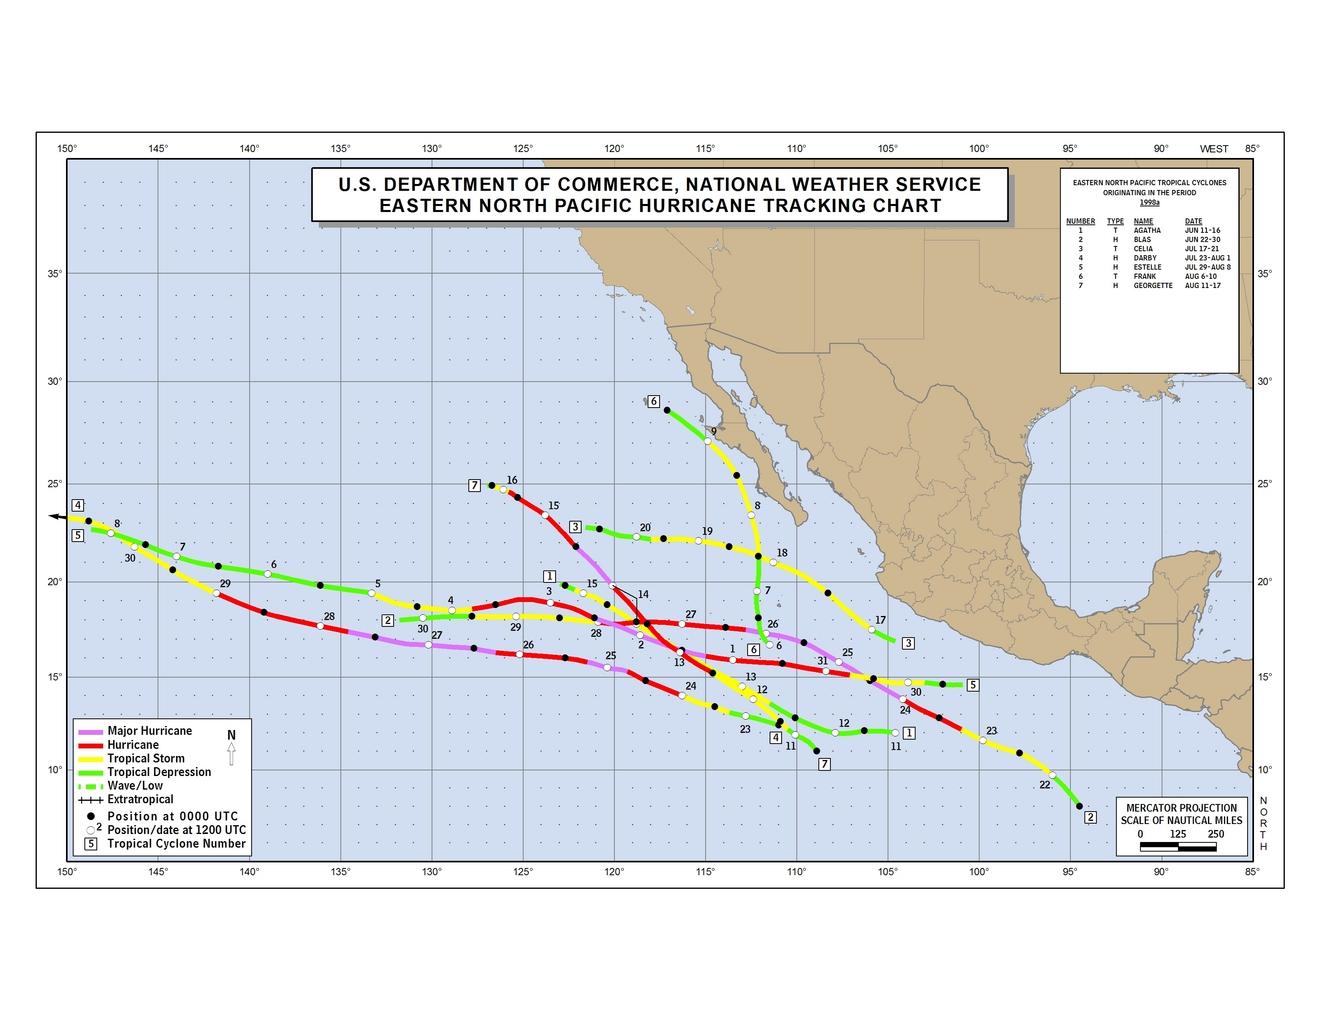 1998 Eastern Pacific Hurricane Season